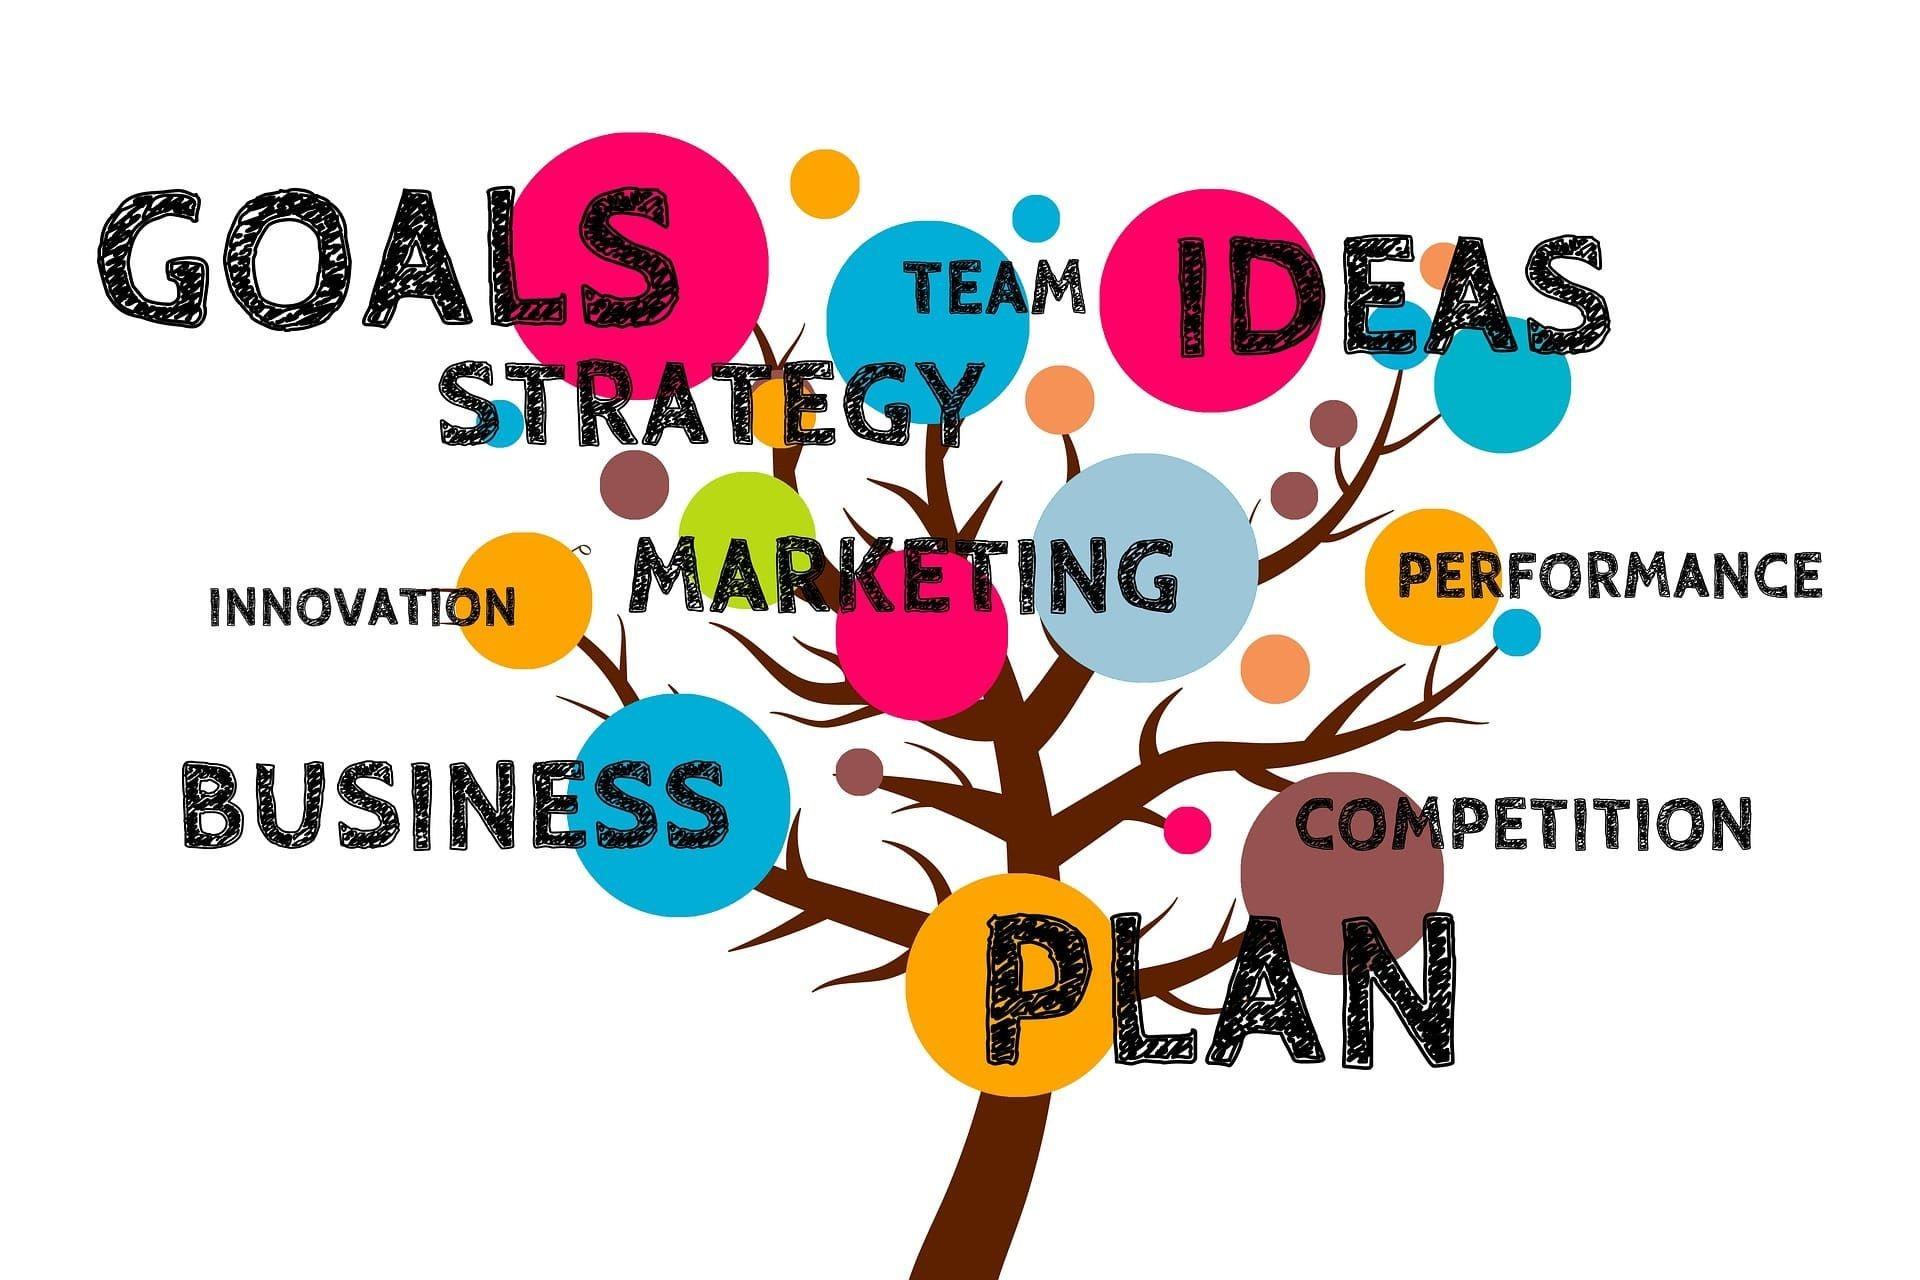 005 Marvelou Multi Level Marketing Busines Plan Template Design  Network Pdf1920